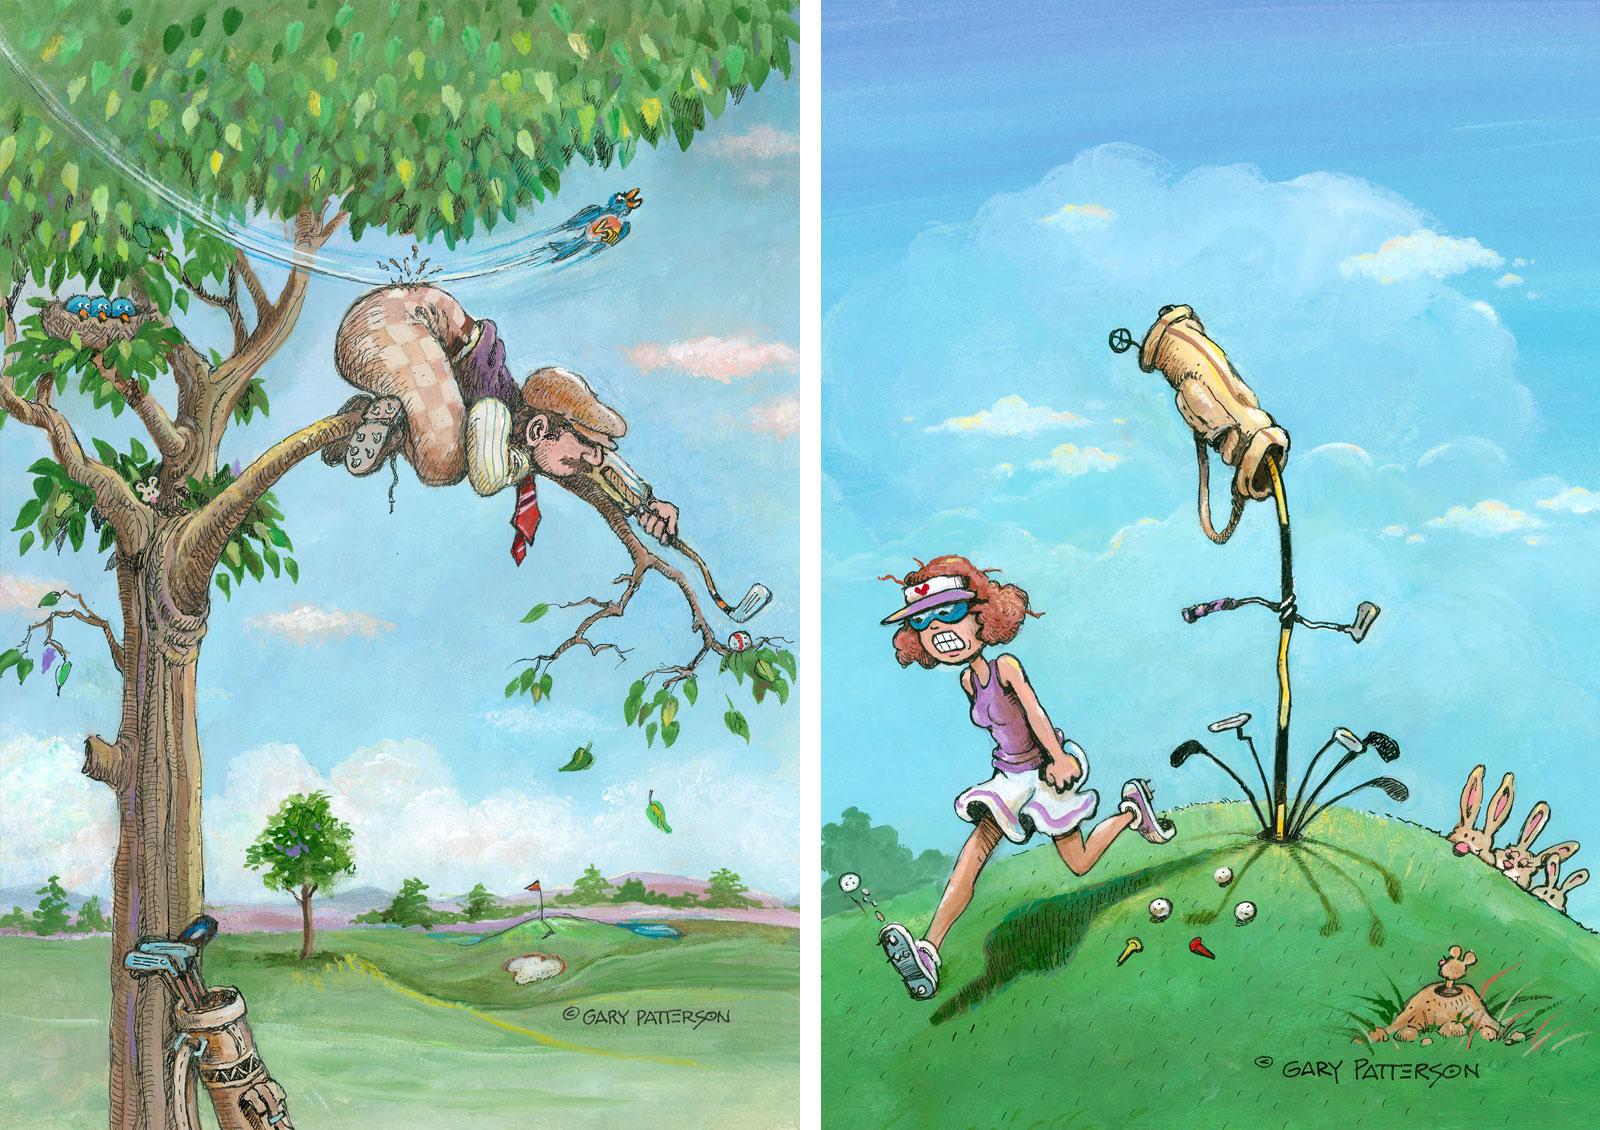 Golf humor by cartoon artist Gary Patterson